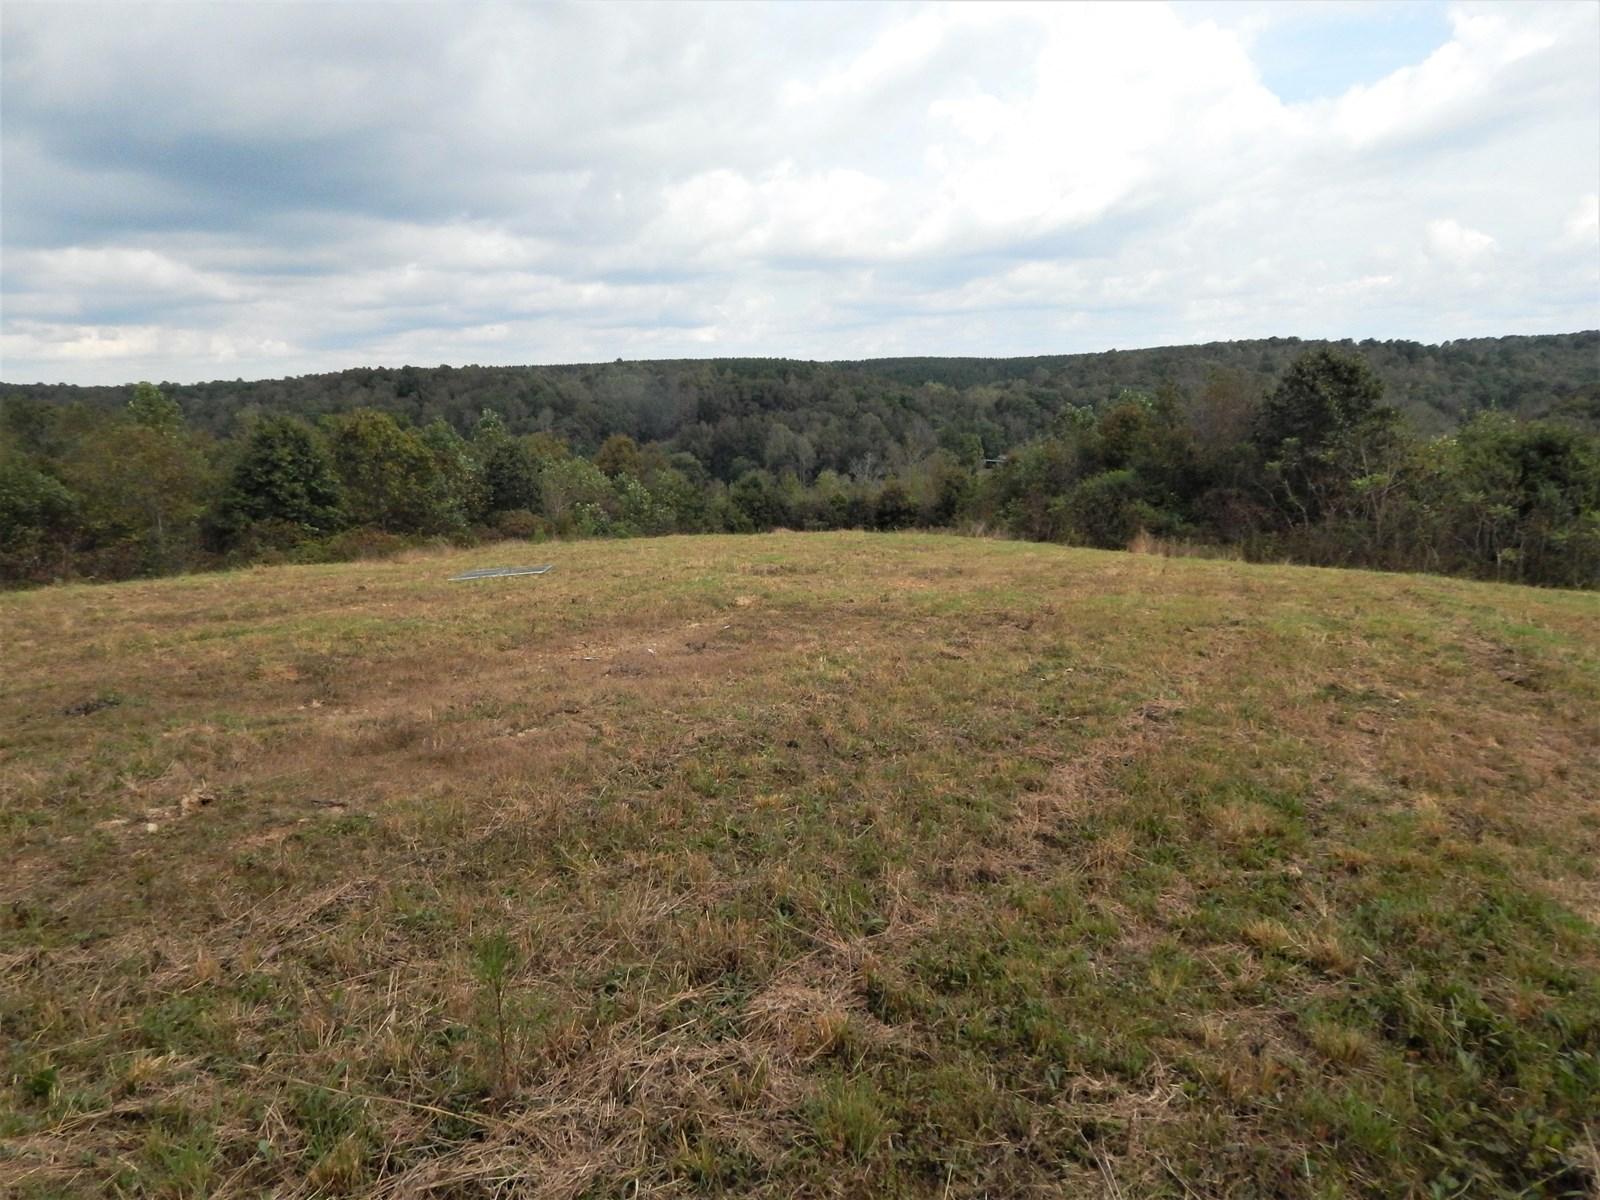 Wayne Co., Tn. Hunting Land, Building Sites, Stream, & Views